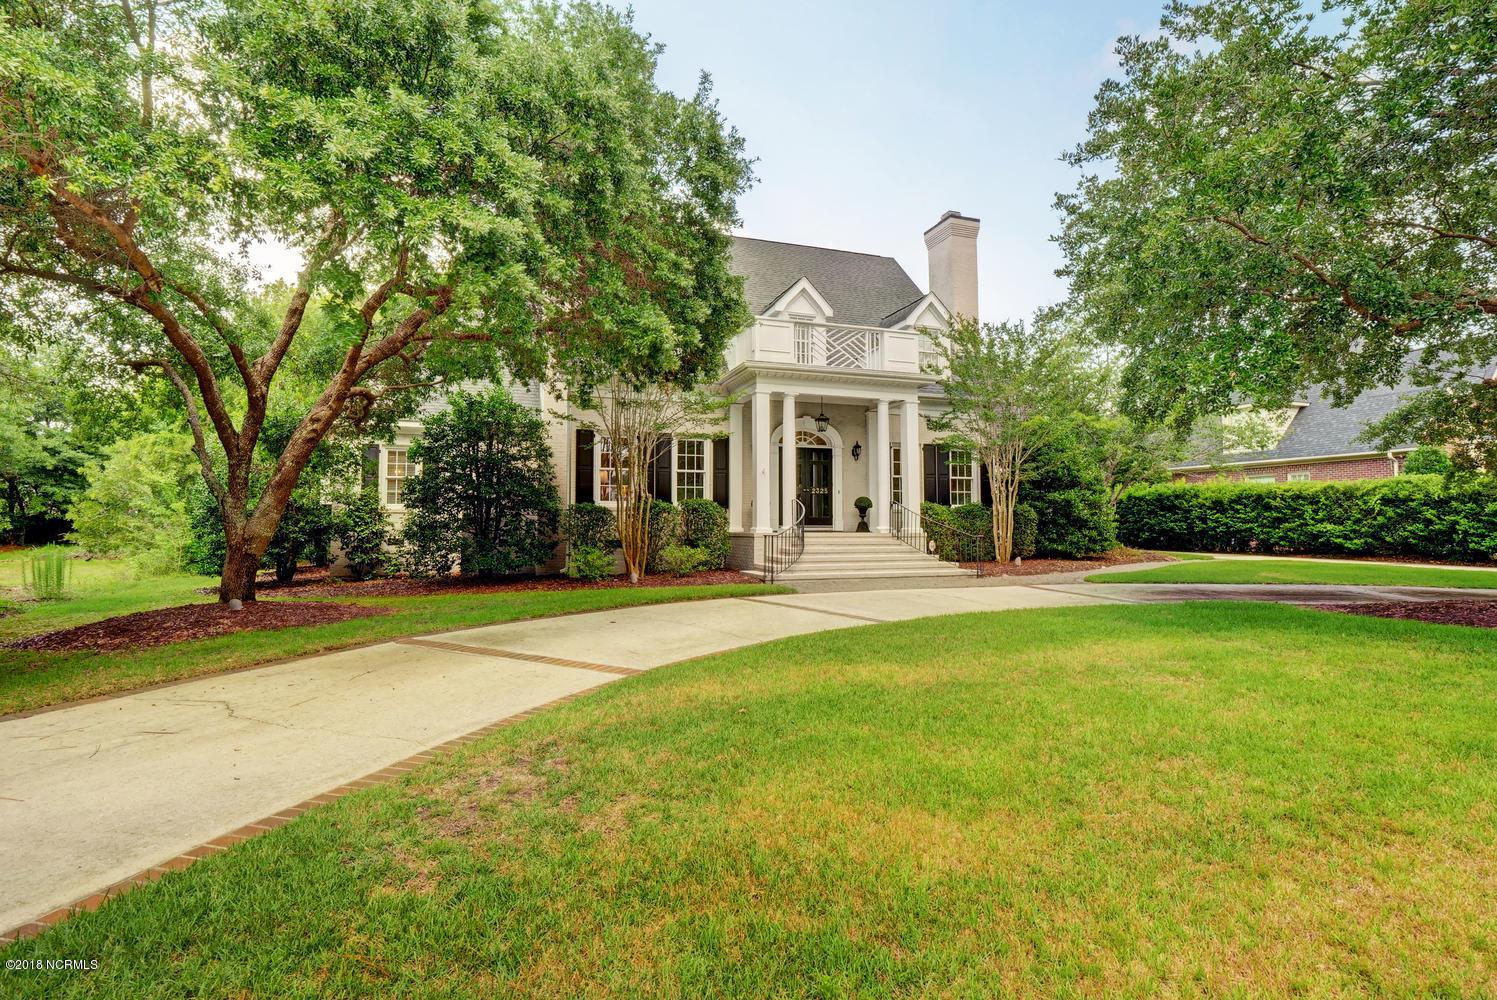 2325 Tattersalls Drive, Wilmington, North Carolina, 5 Bedrooms Bedrooms, 11 Rooms Rooms,3 BathroomsBathrooms,Single family residence,For sale,Tattersalls,100121830